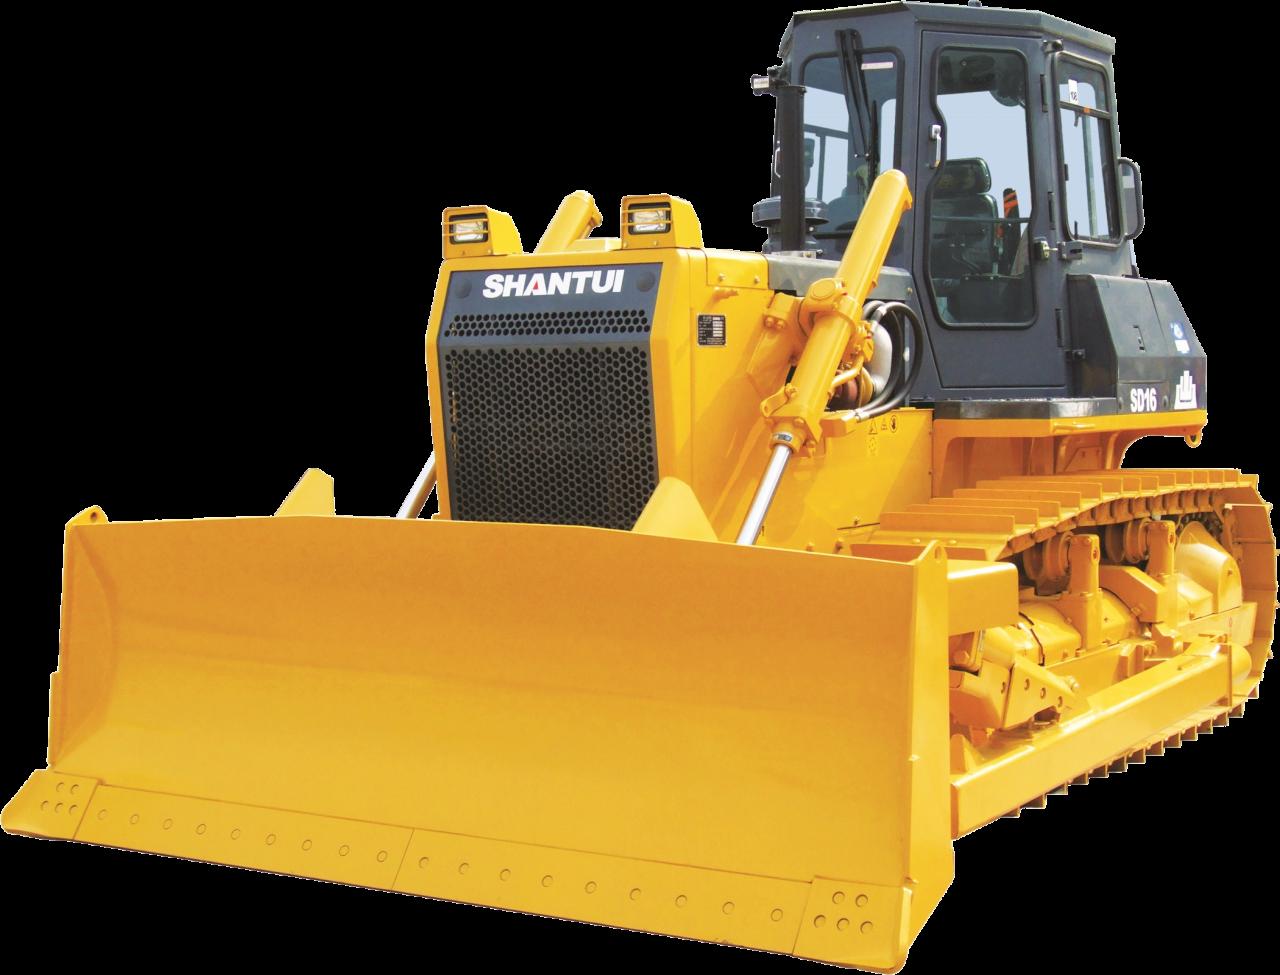 Bulldozer B10 PNG Image